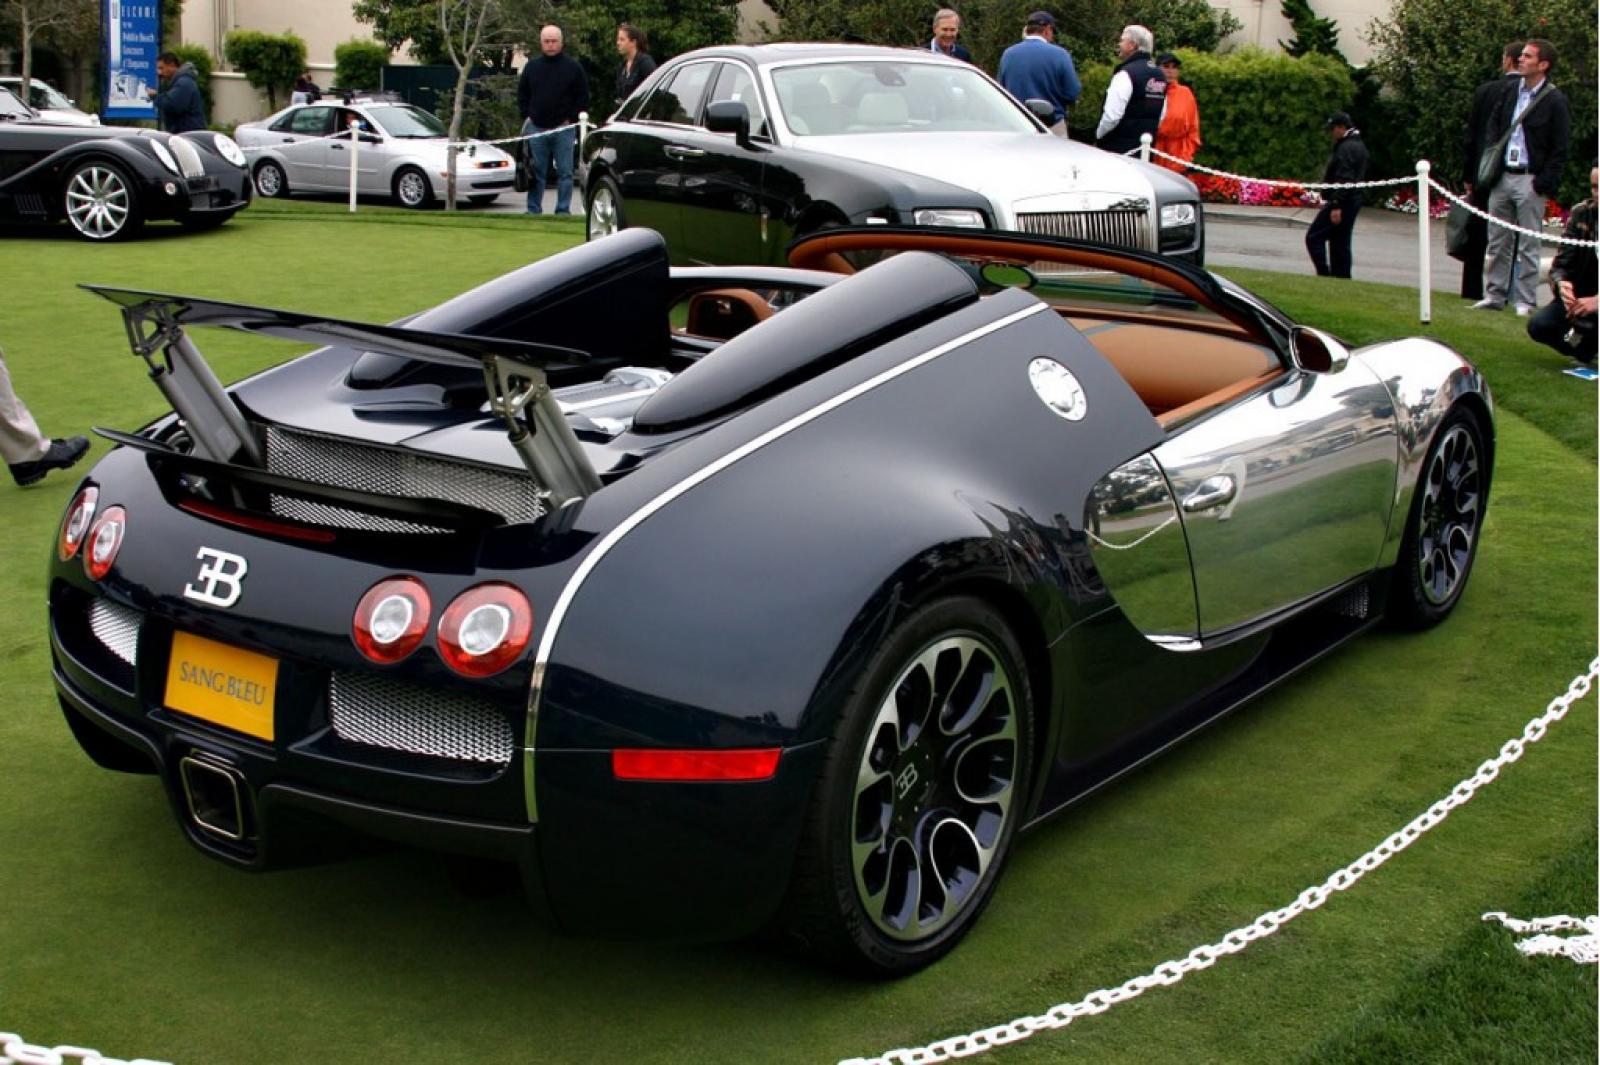 Bugatti  pictures information amp specs  NetCarShowcom